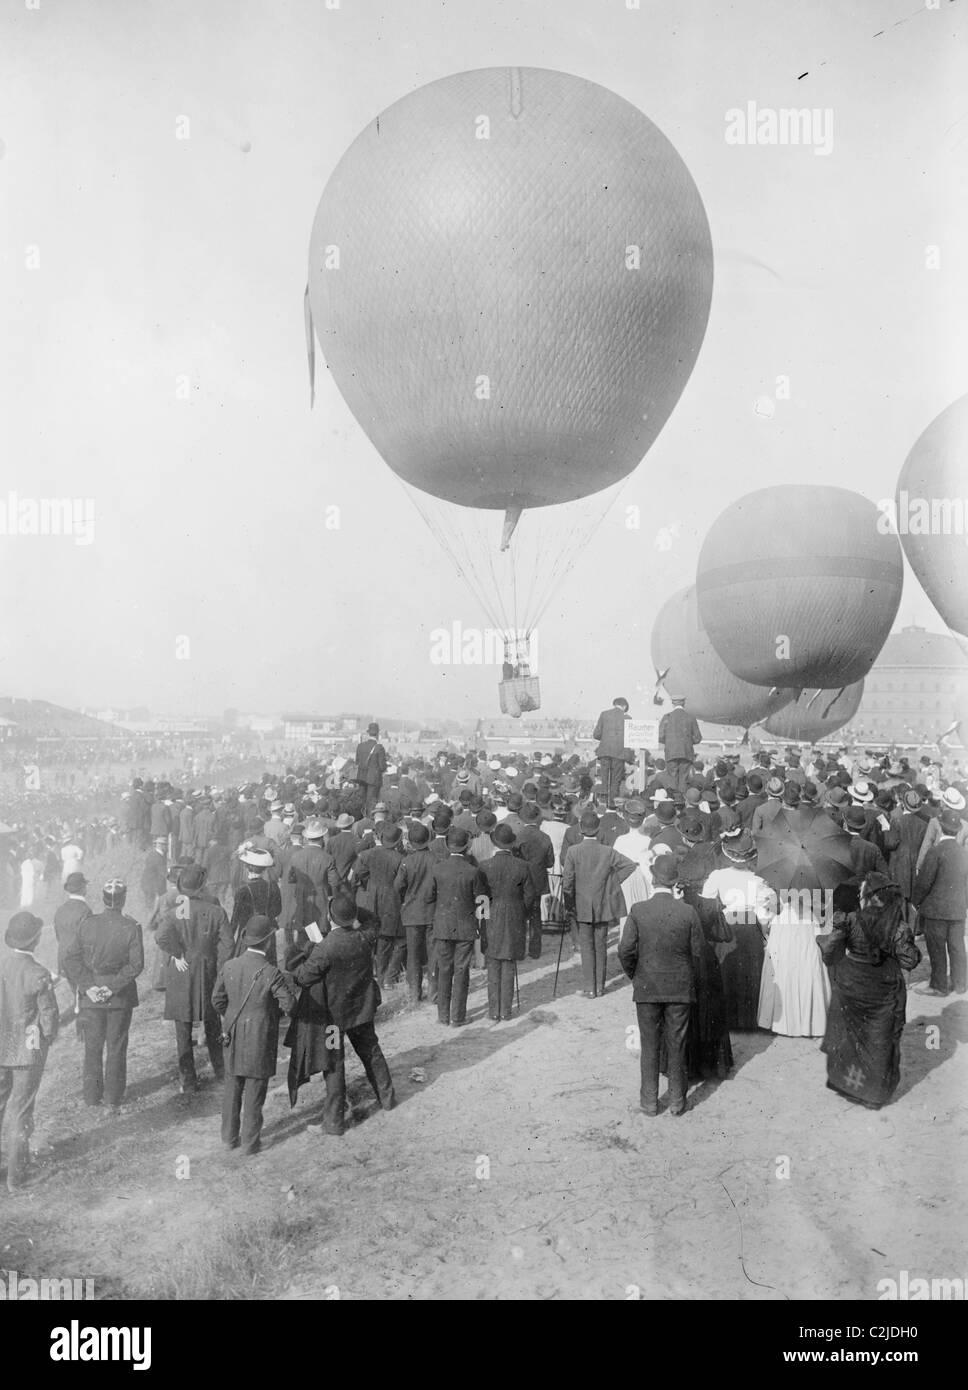 Carrera de globos de Berlín Imagen De Stock